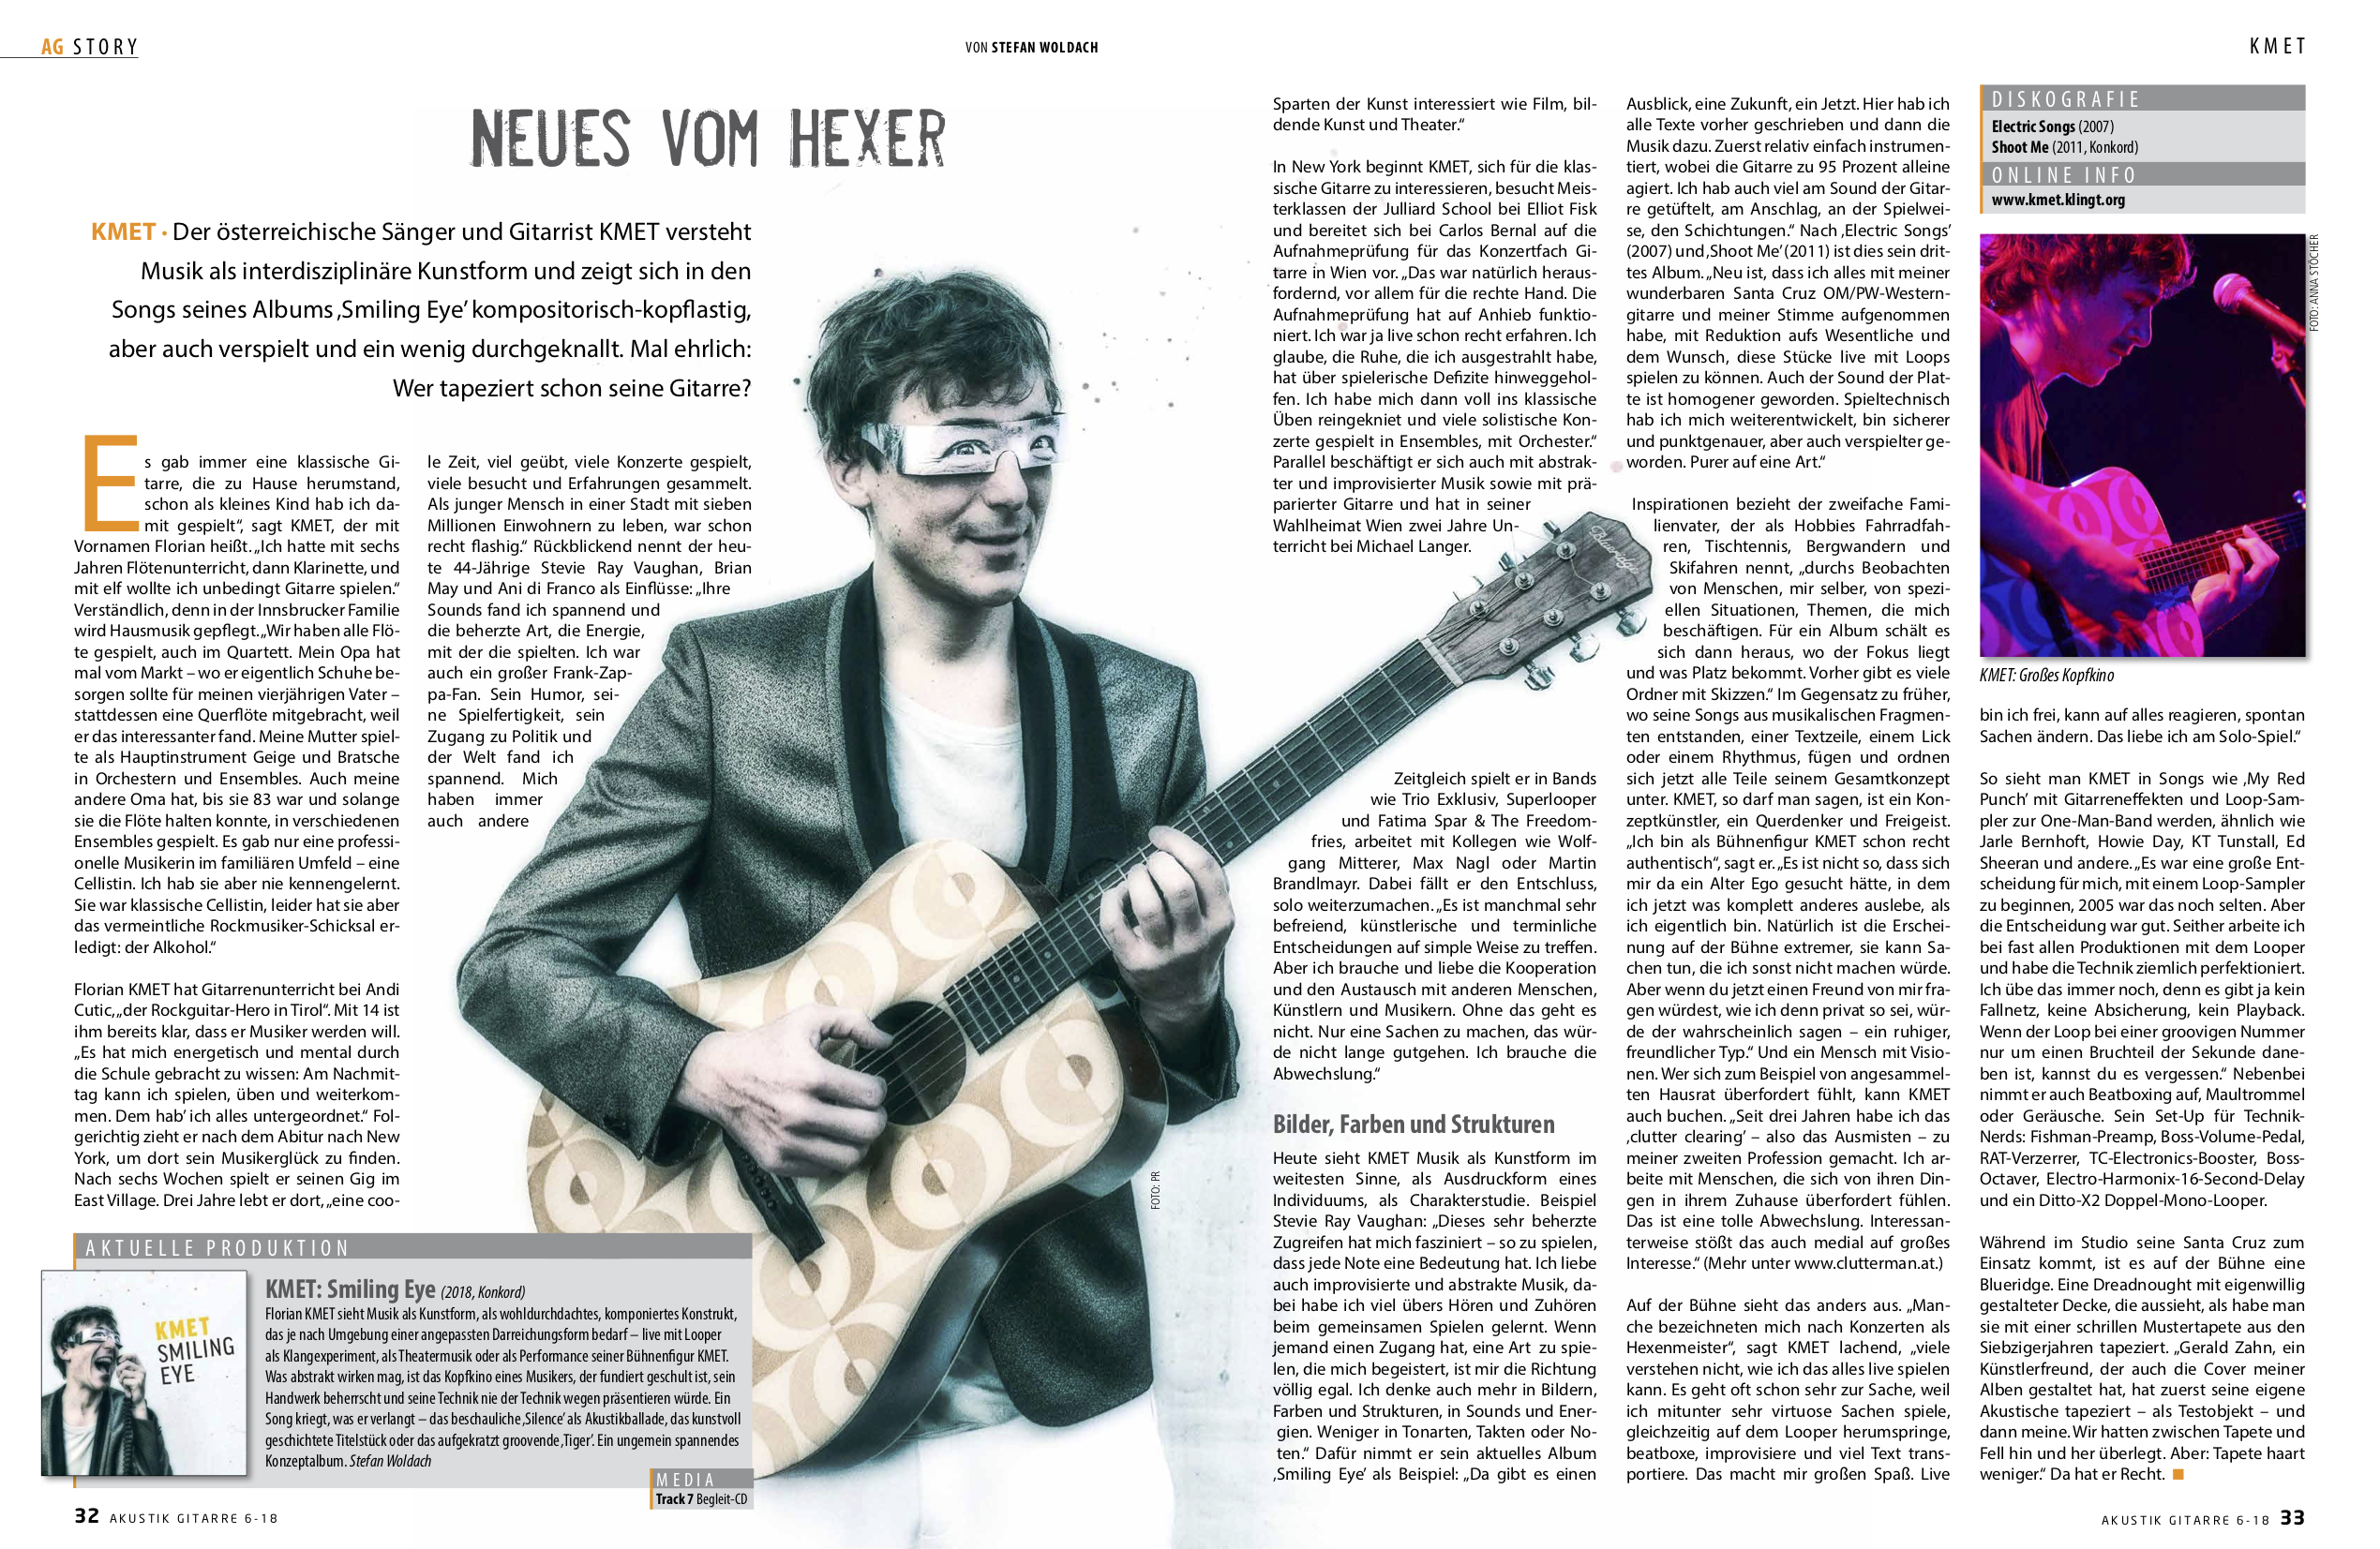 Neues vom Hexer_KMET_Akustik_Gitarre